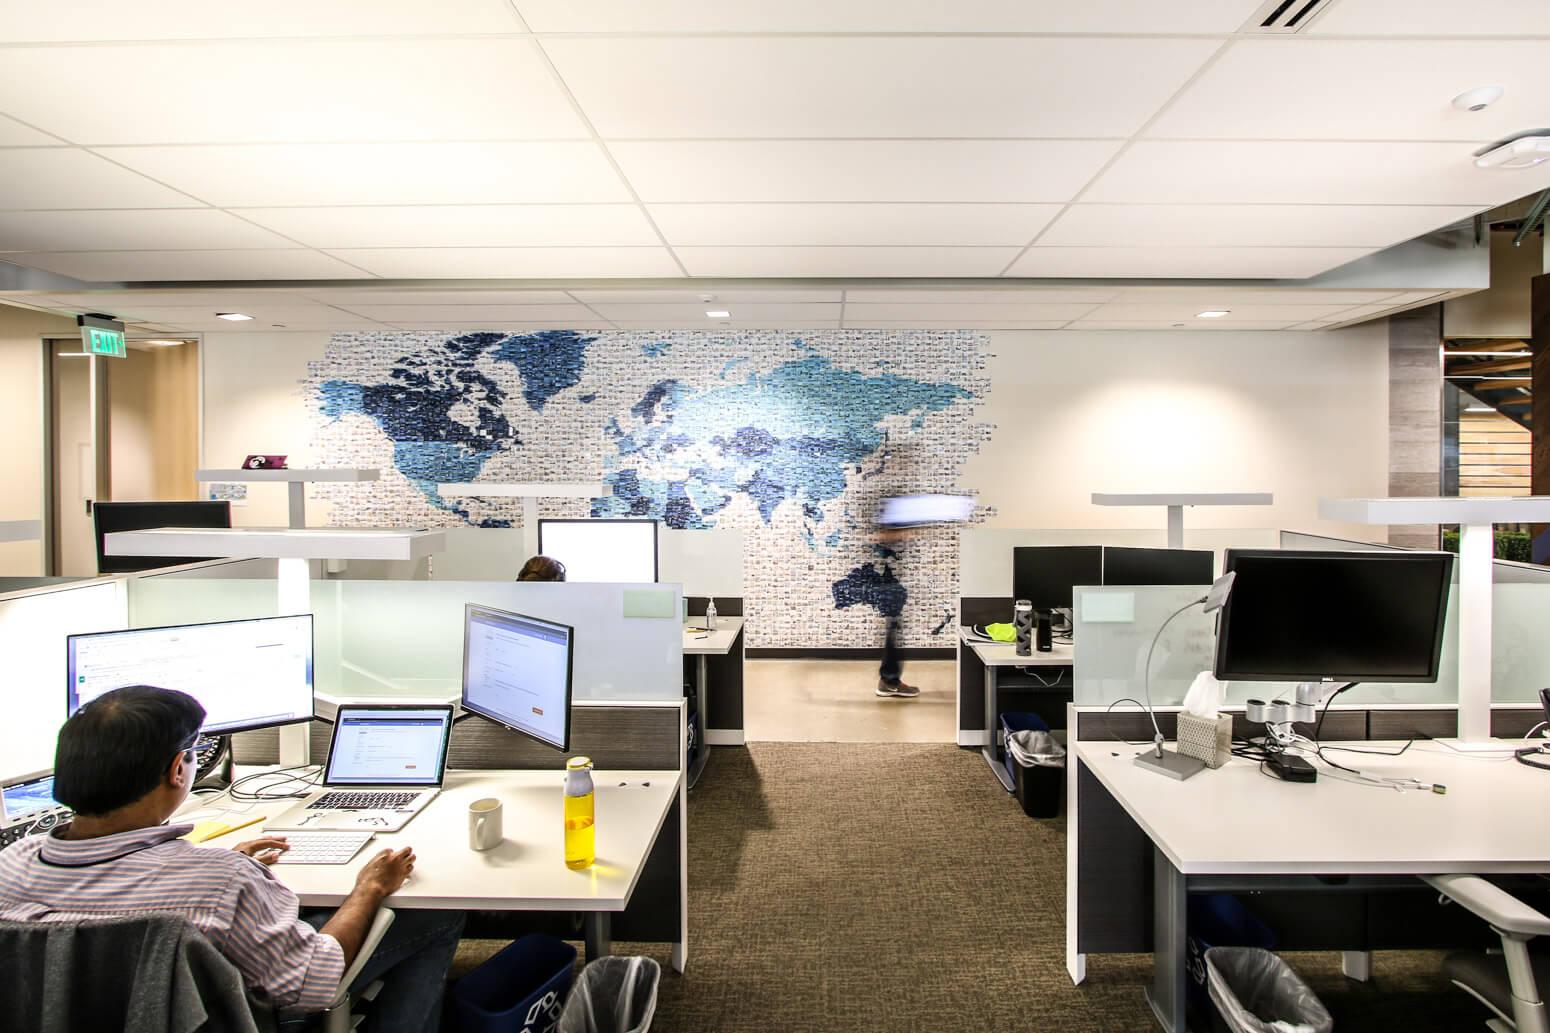 HomeAway Austin Office Killer Spaces-19